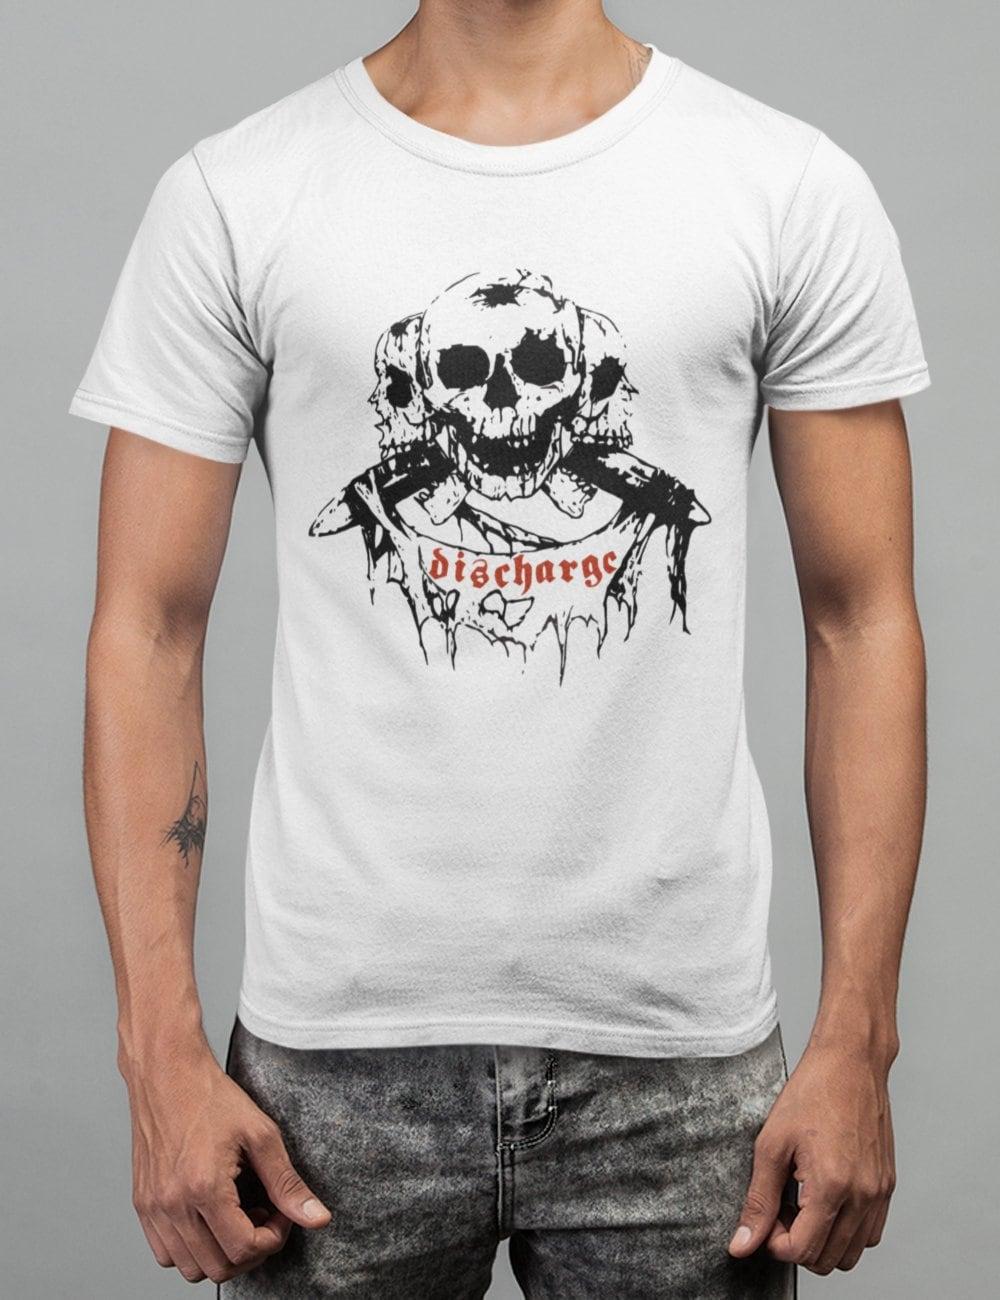 Maglietta T-shirt Musica Hard Punk Rock Chiatarra Teschio Old School Star Shirts